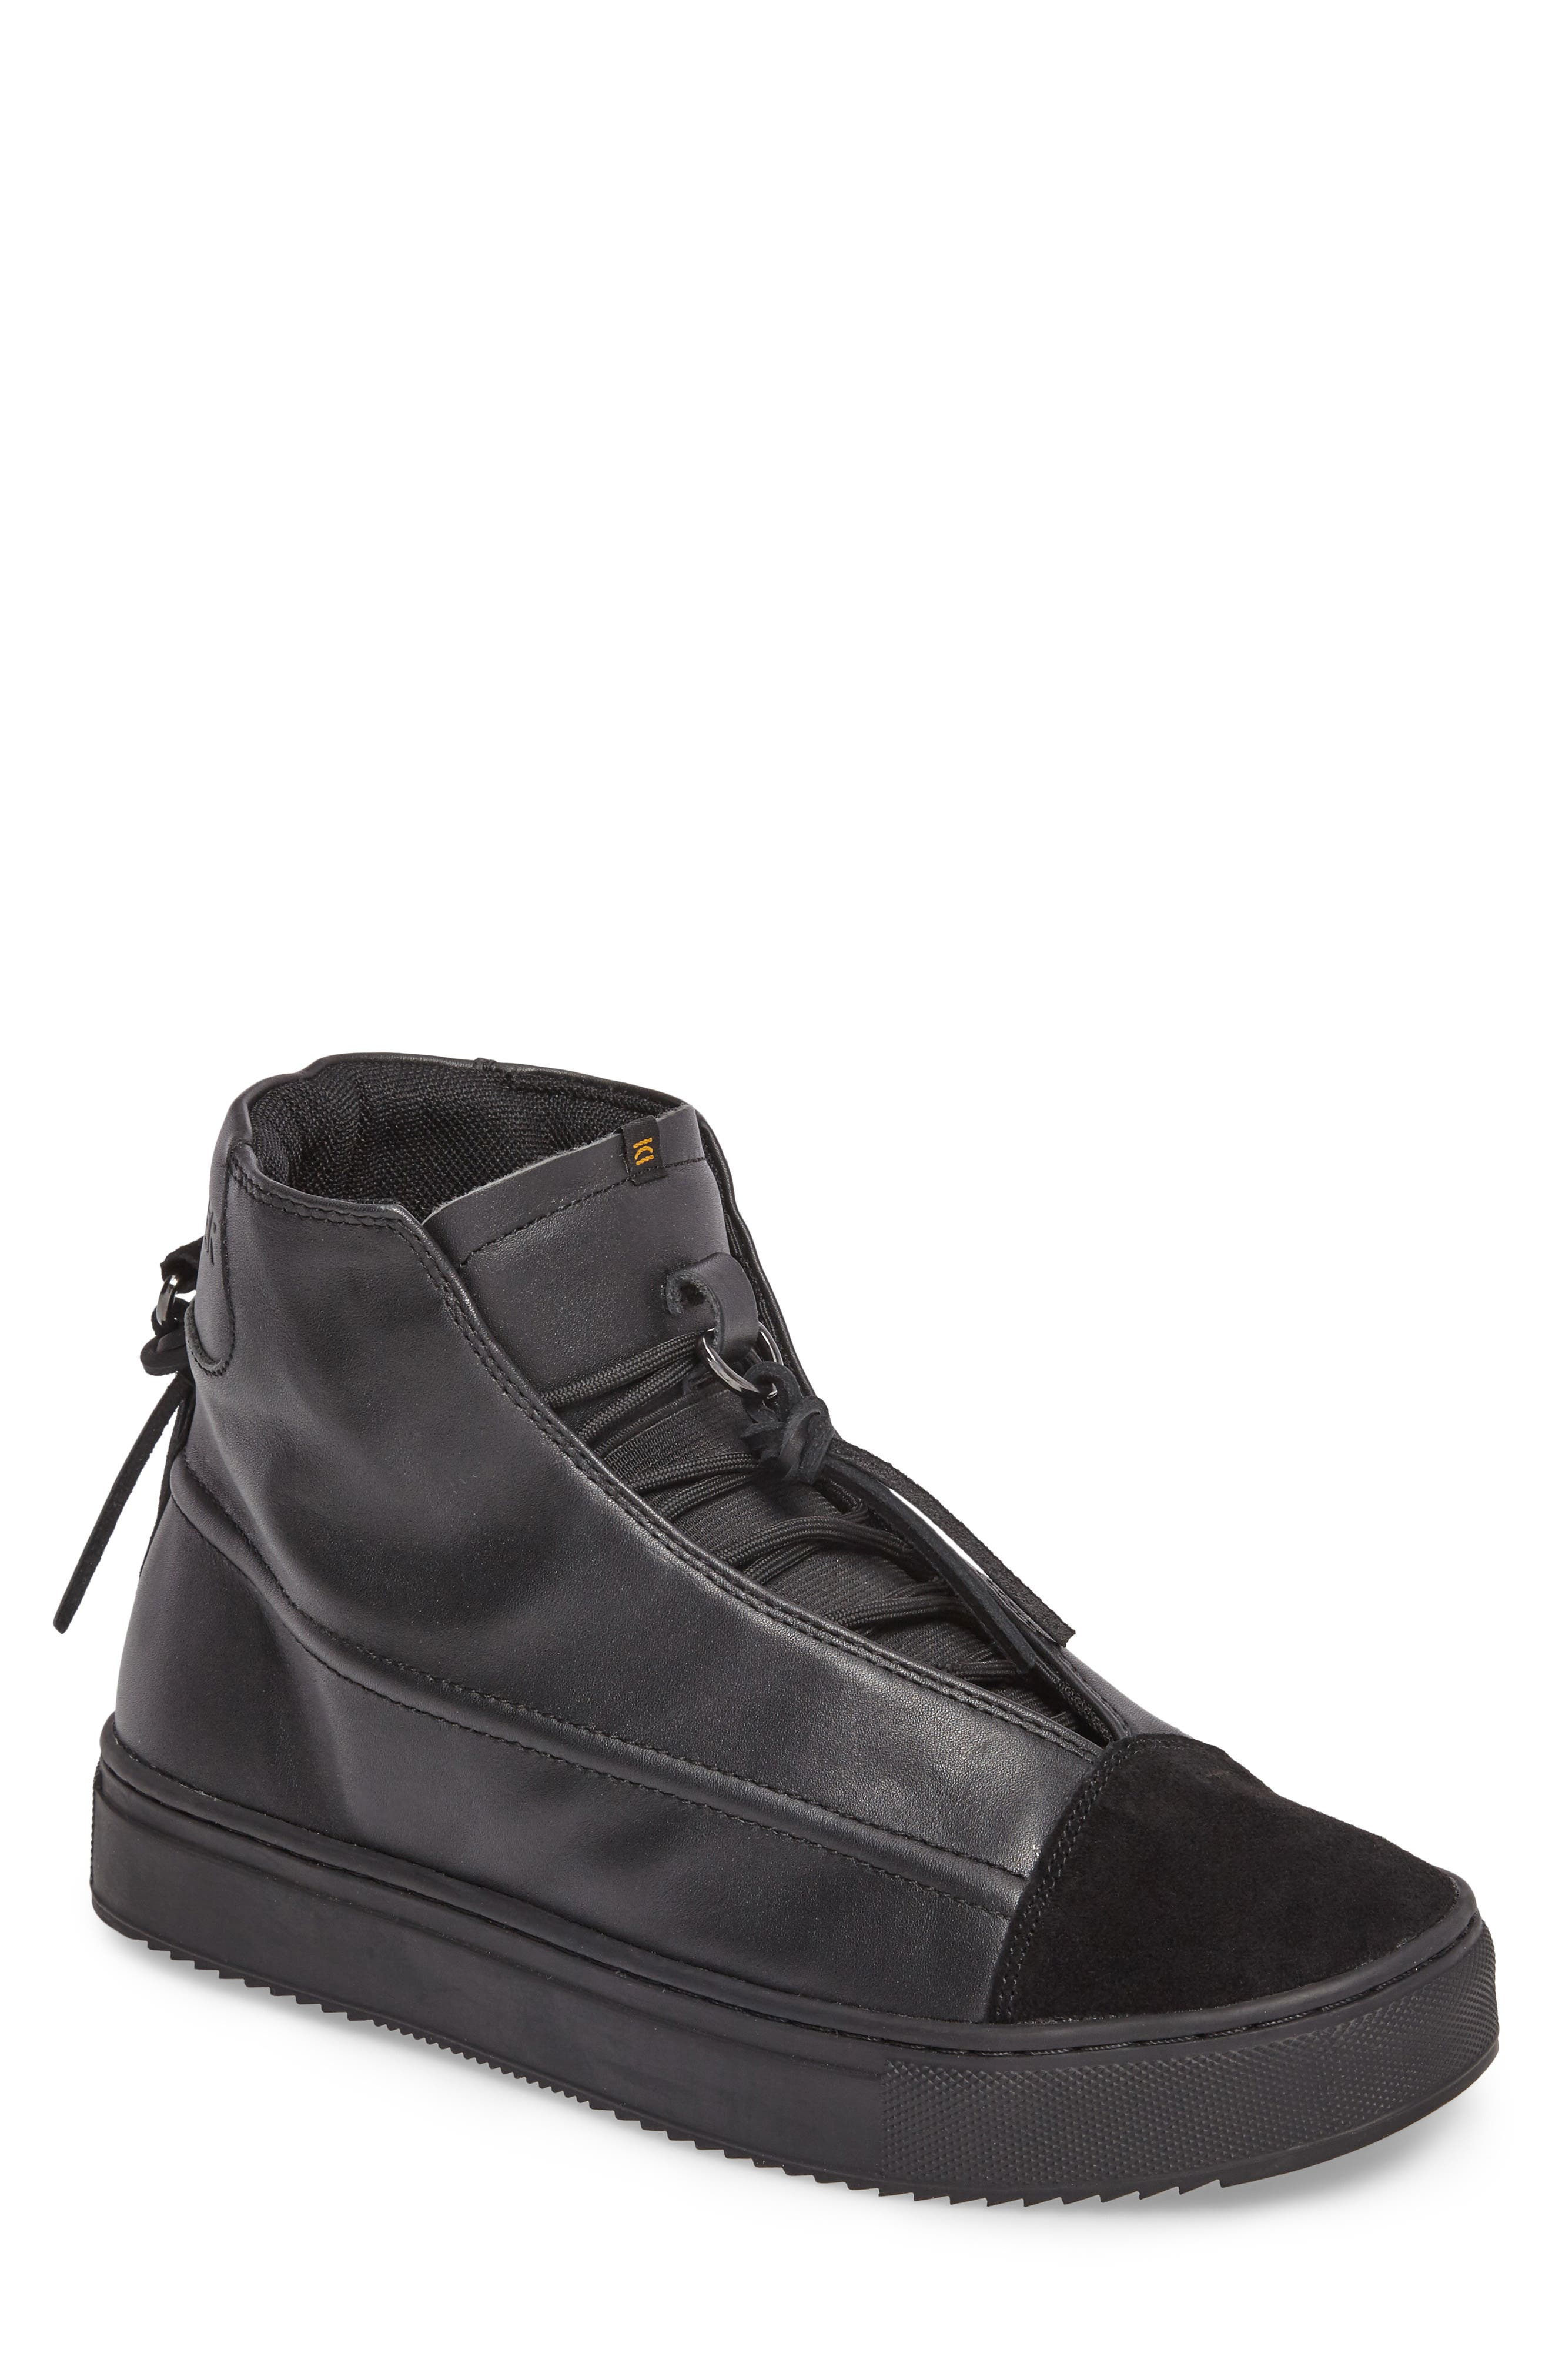 Sidney High Top Sneaker,                         Main,                         color, Black